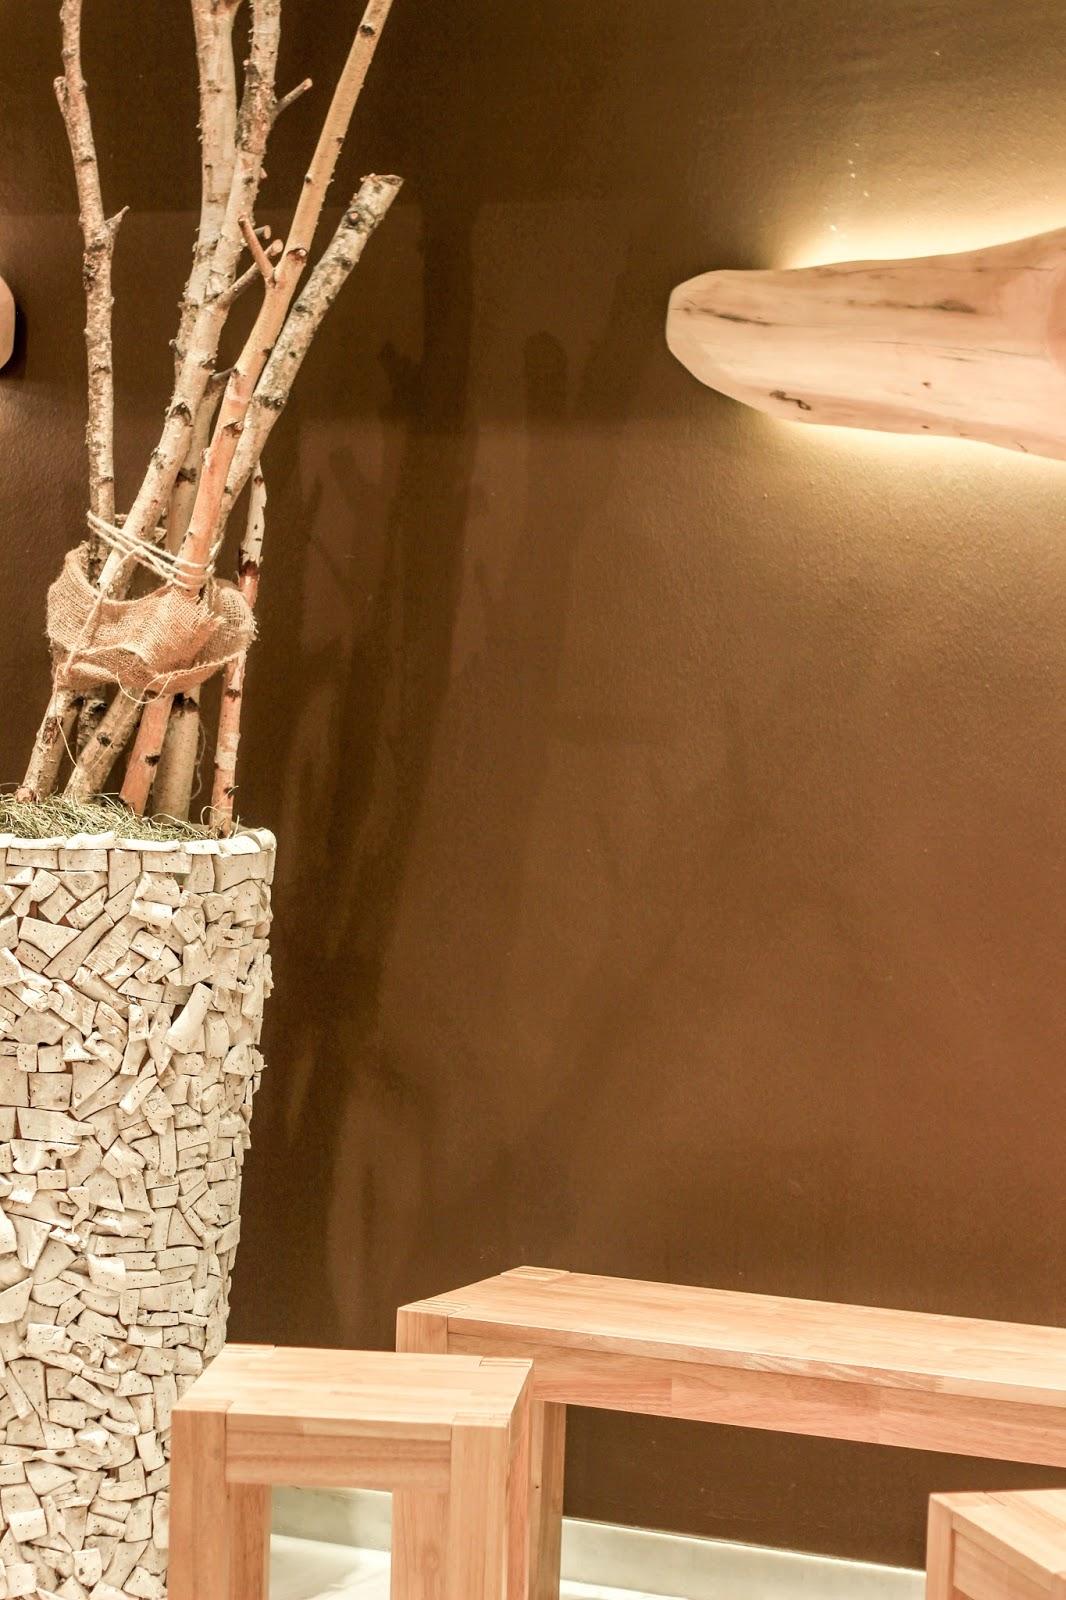 Seefeld Reiseblogger Travelblogger Fashionstylebyjohanna Blogger Fashion Fashionblog Fashionblogger Blog Bloggerin Deutschlands Travelblogs Deutsche Fashionblogger Fashion Fashioninspiration Hotelbewertung Dorint Hotel Dorinthotels Resorts Berge Bergbilder Hotelbewertung Outfit Blog Fashioninspiration Skioutfit Outfitinspiration